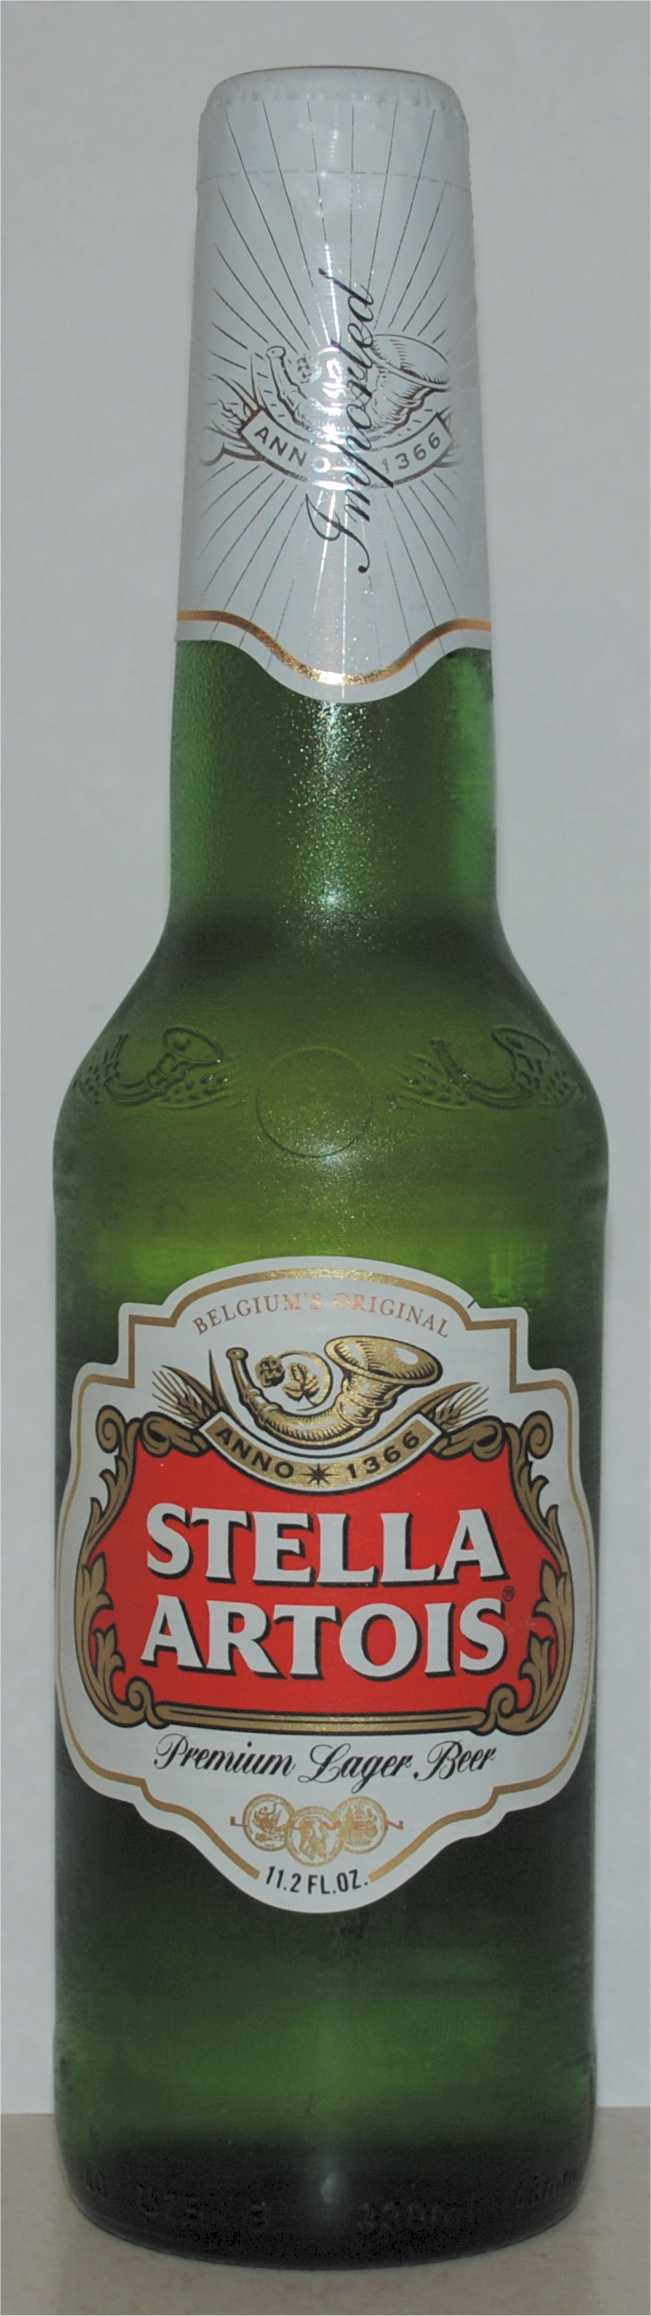 Stella Artois Premium Lager Beer » Cocktails and Beer